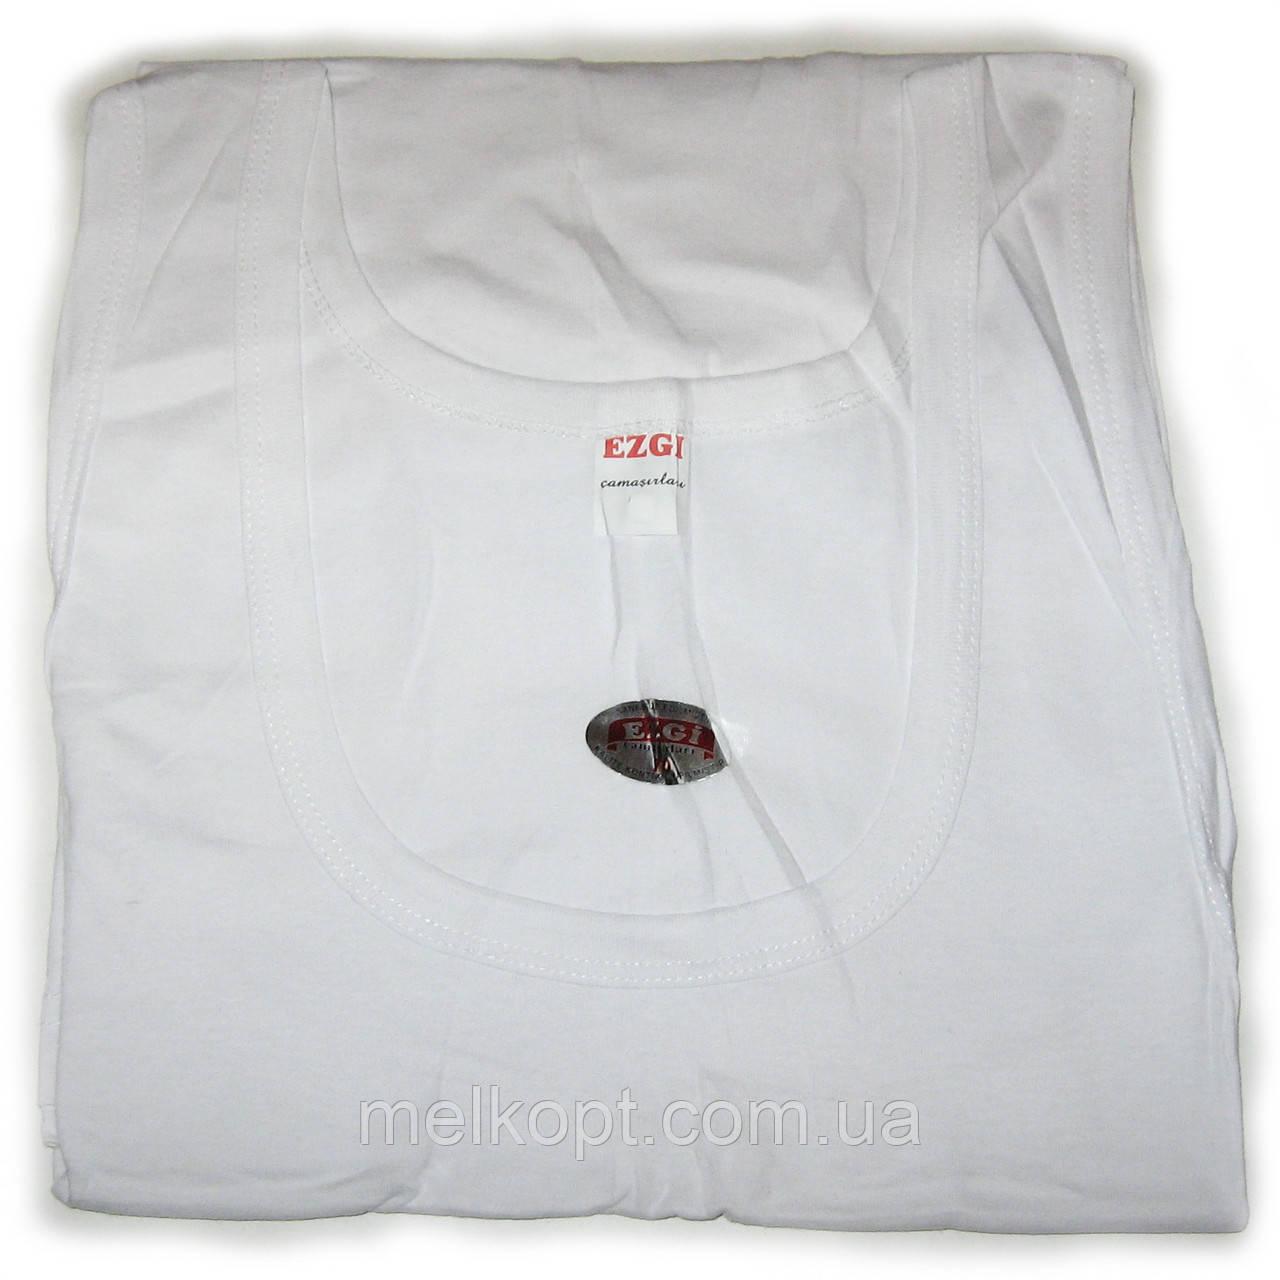 Мужские майки Ezgi - 43,00 грн./шт. (60-й размер, белые)